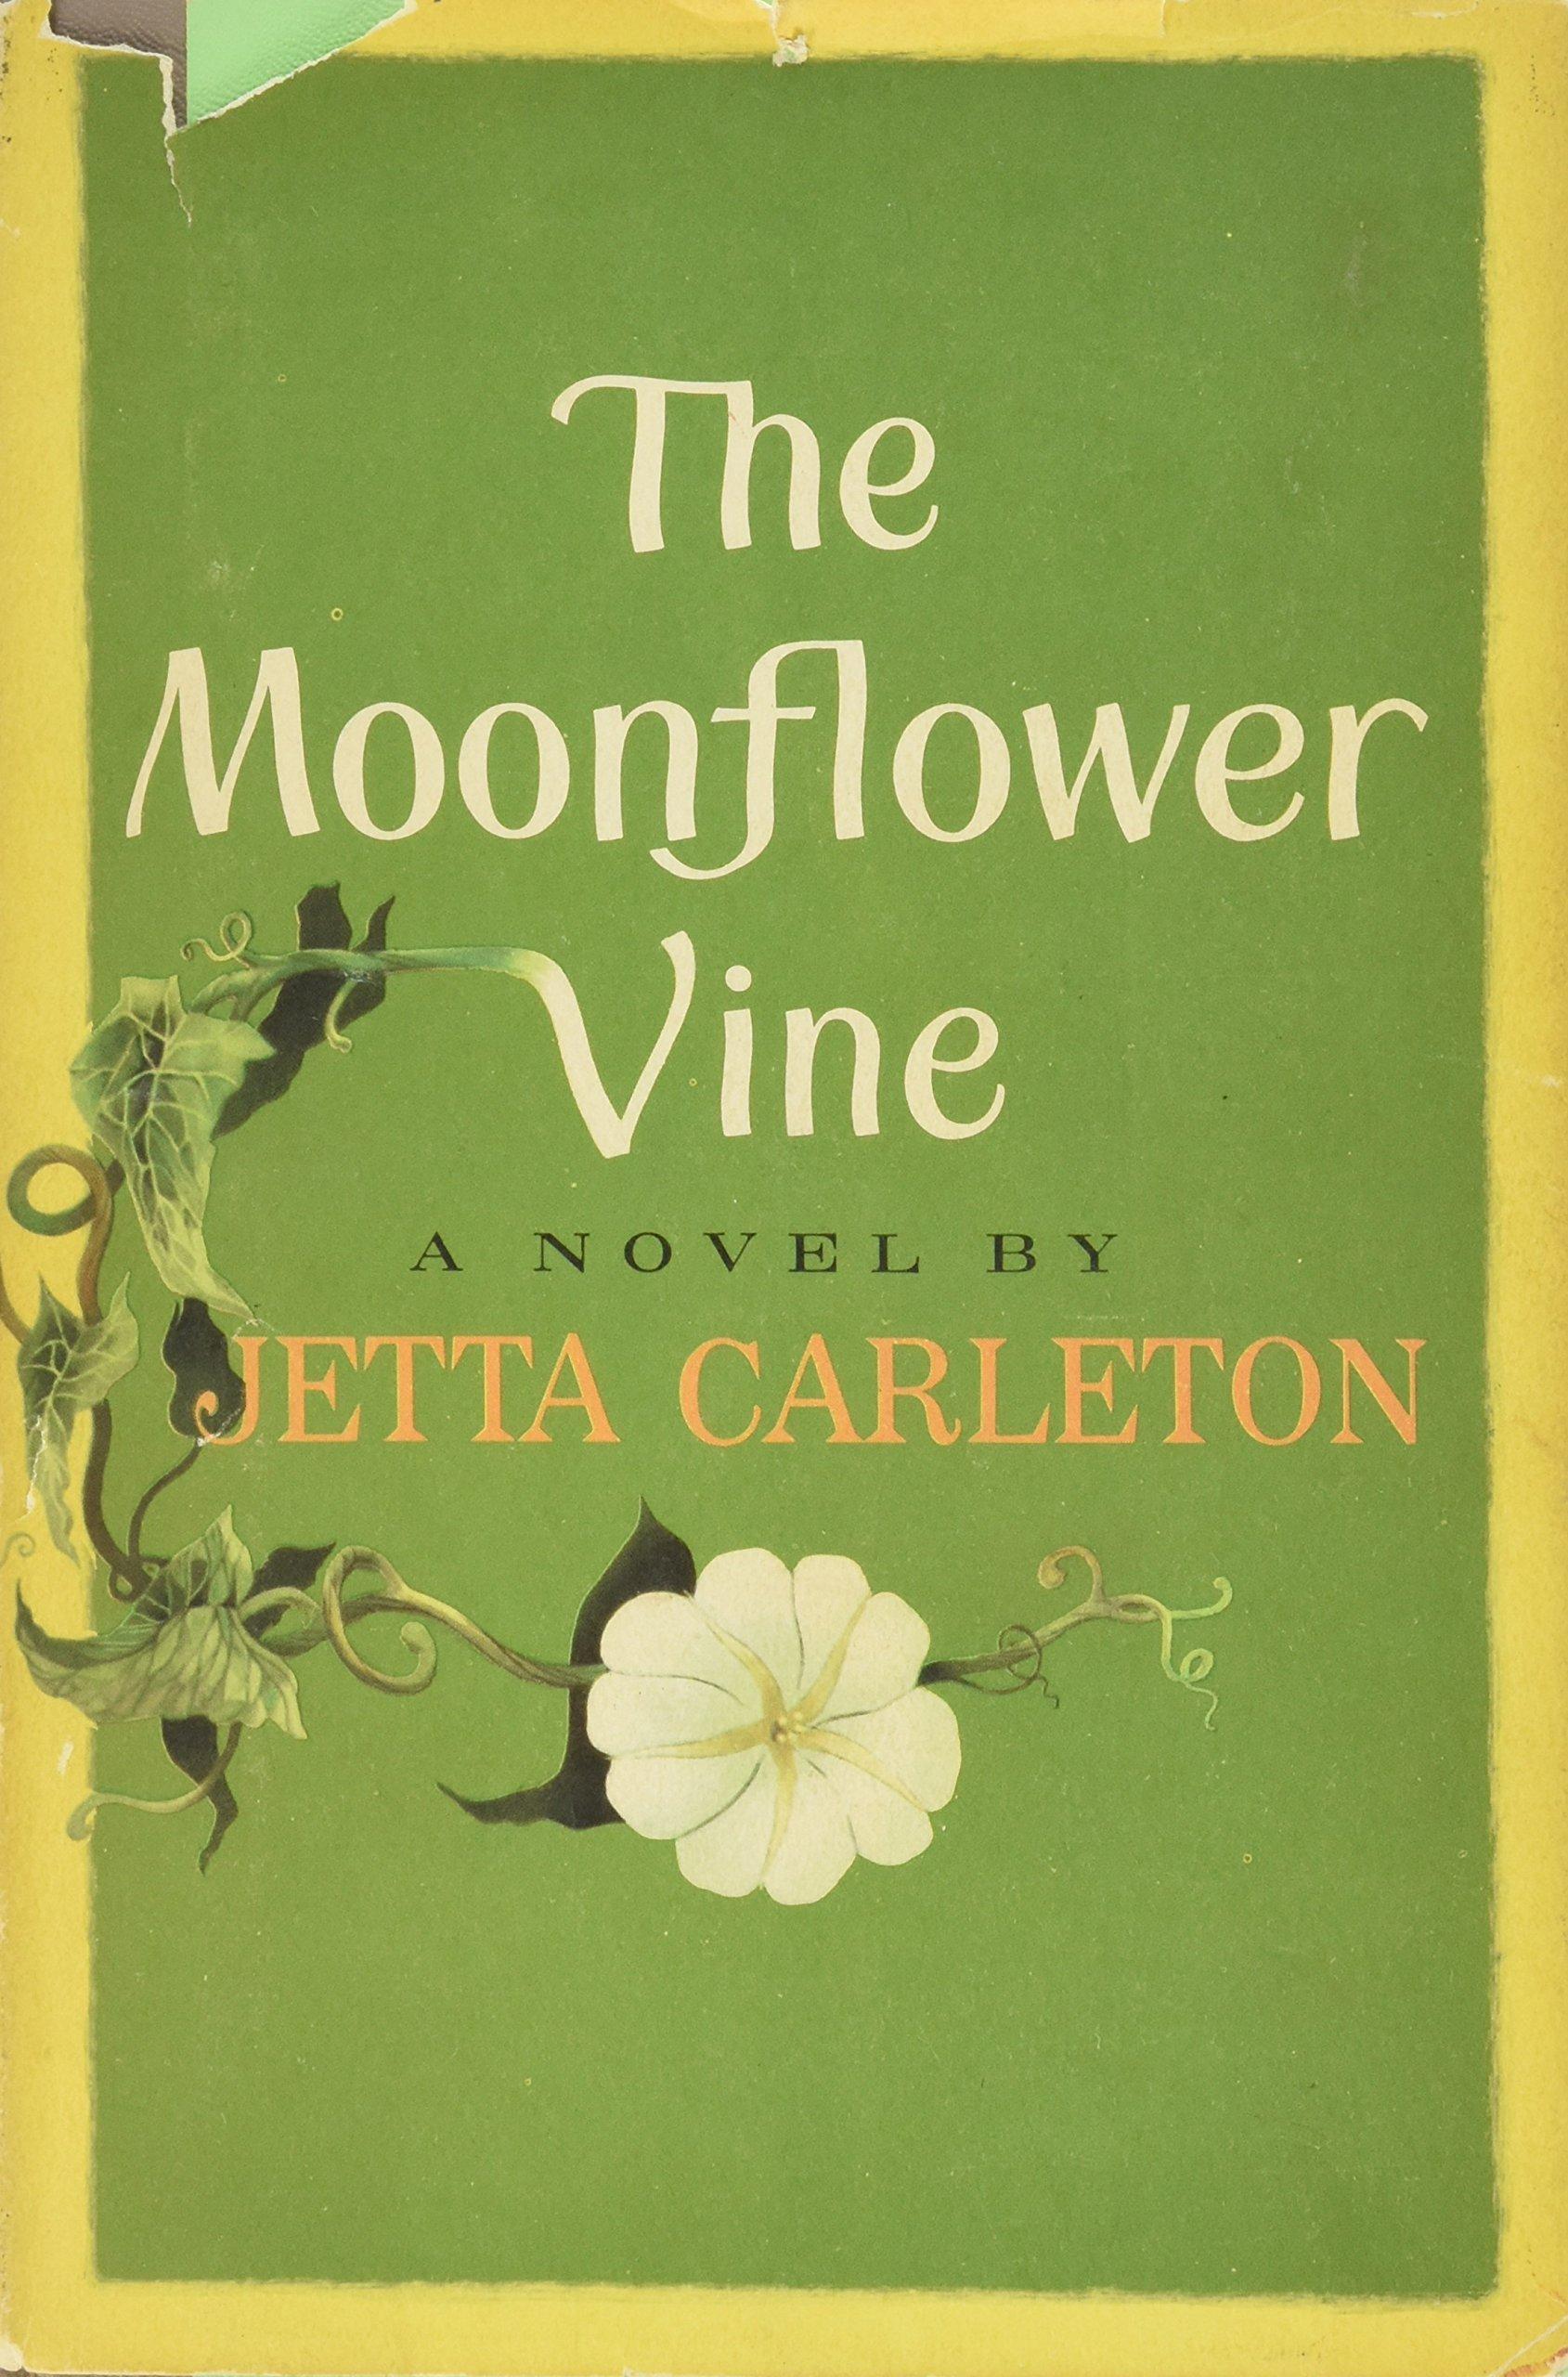 Read The Moonflower Vine By Jetta Carleton